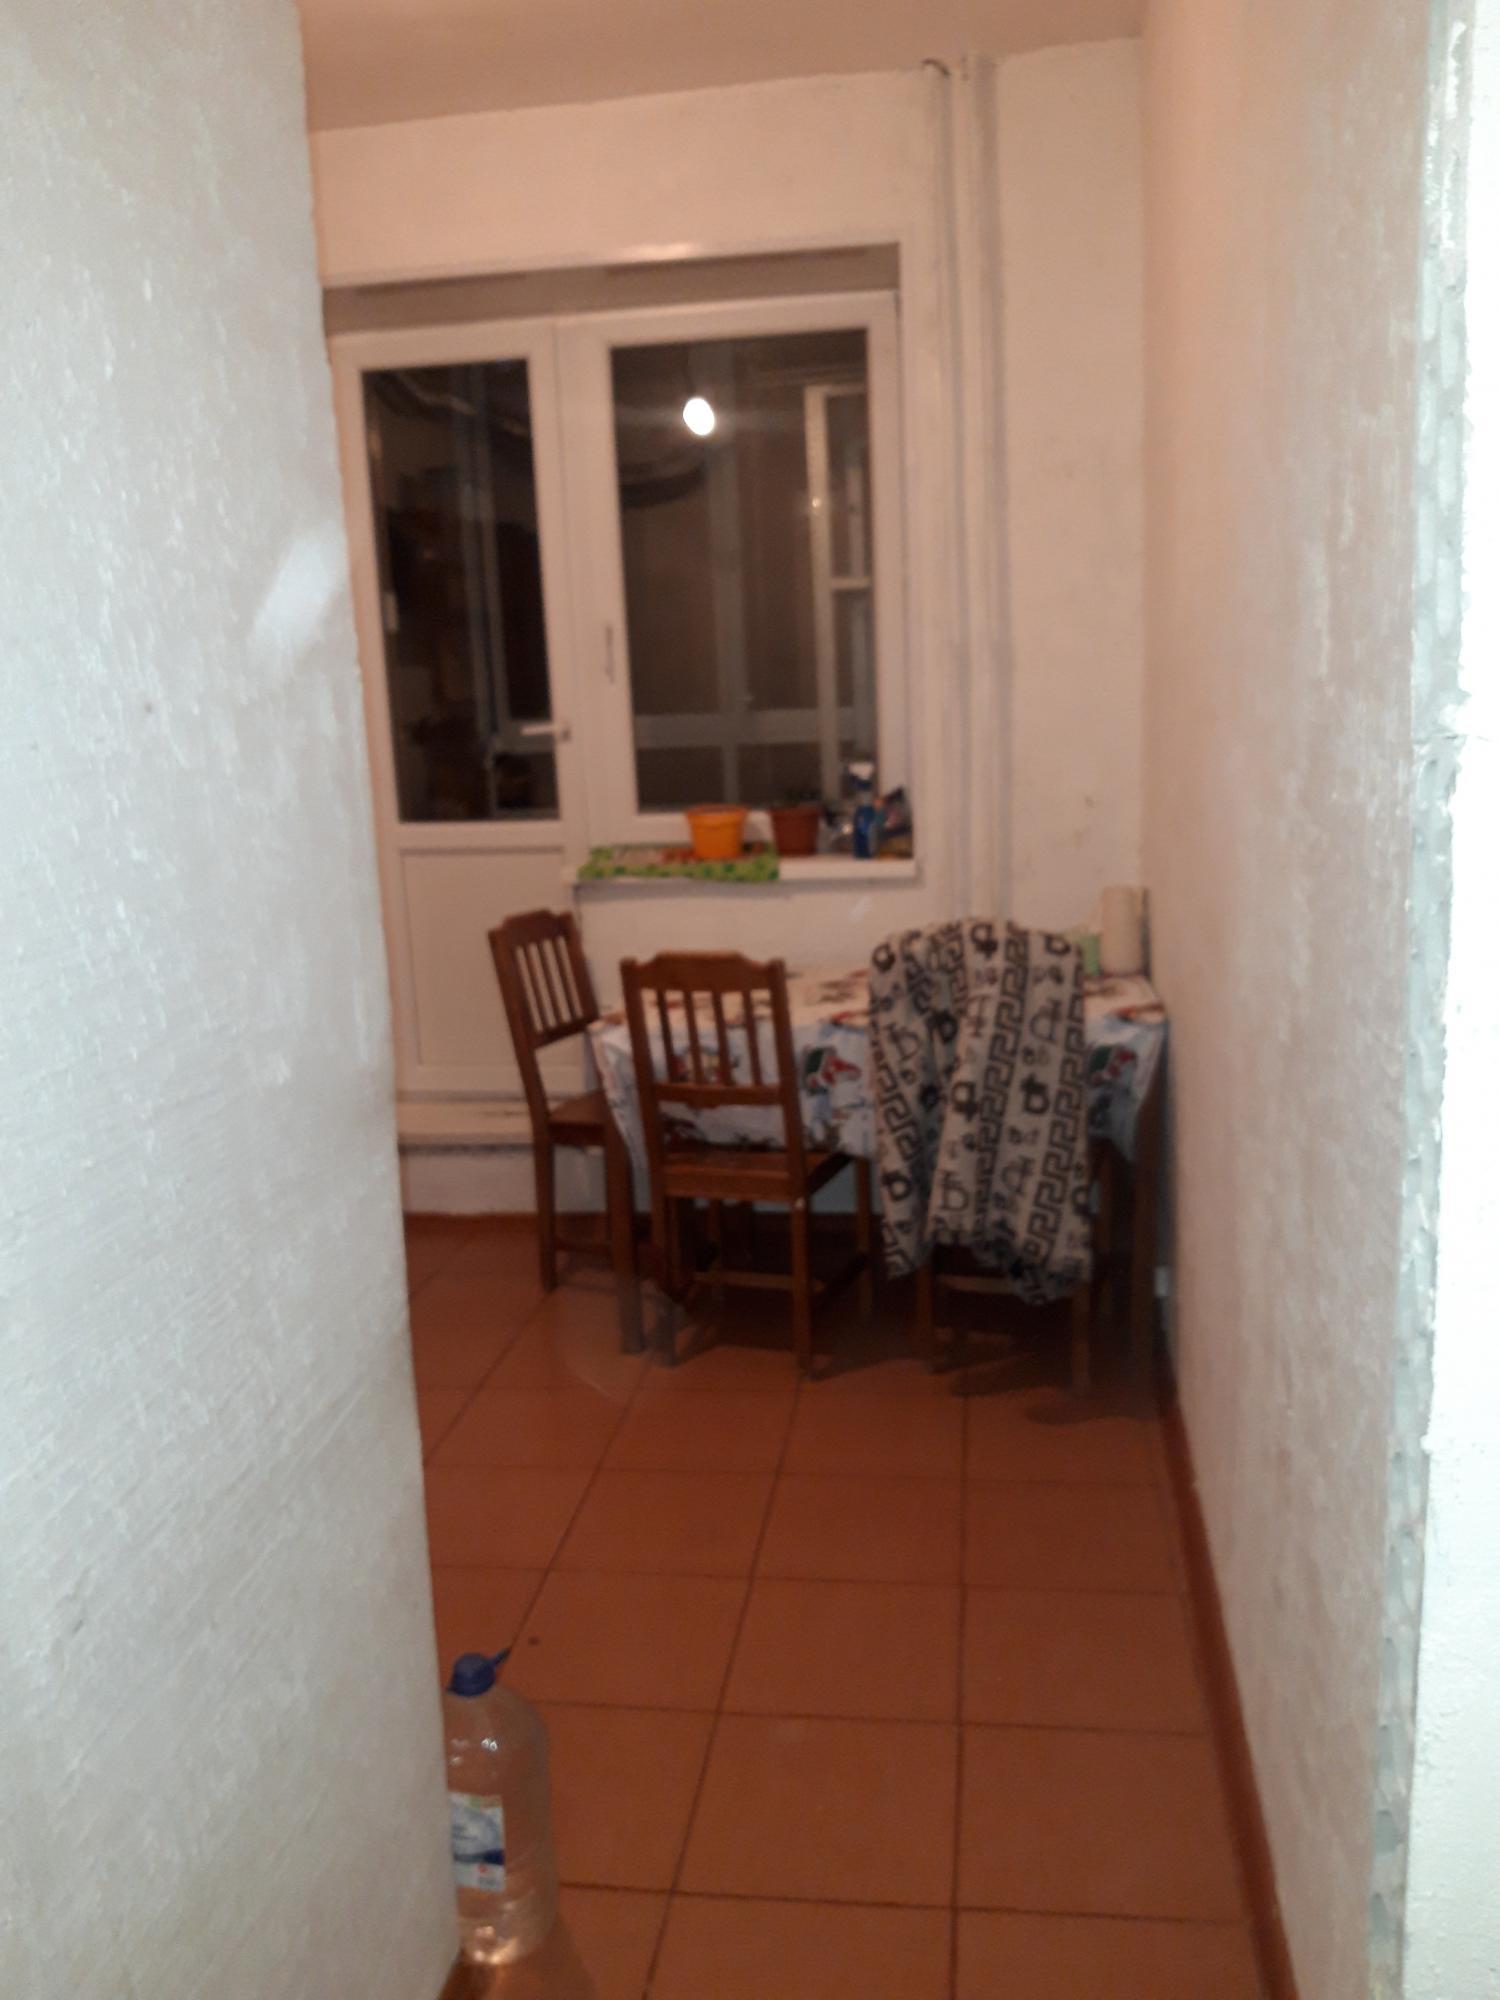 Квартира, 1 комната, 34 м² 89190284316 купить 8